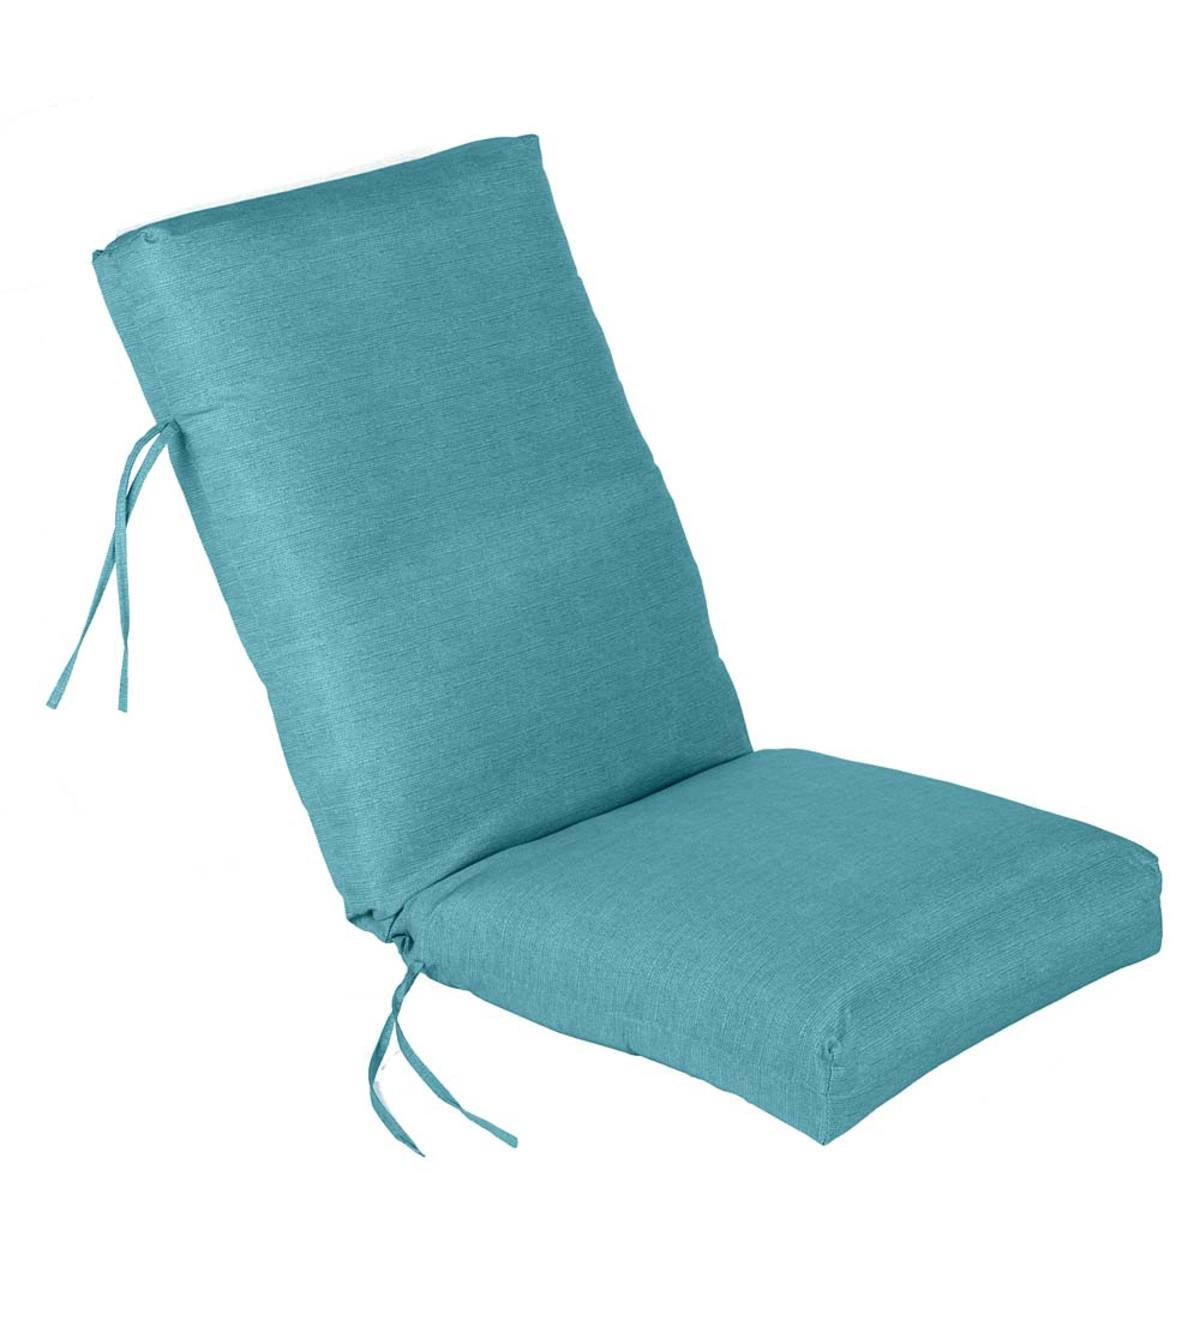 High Quality Shenandoah Outdoor High Back Chair Cushion